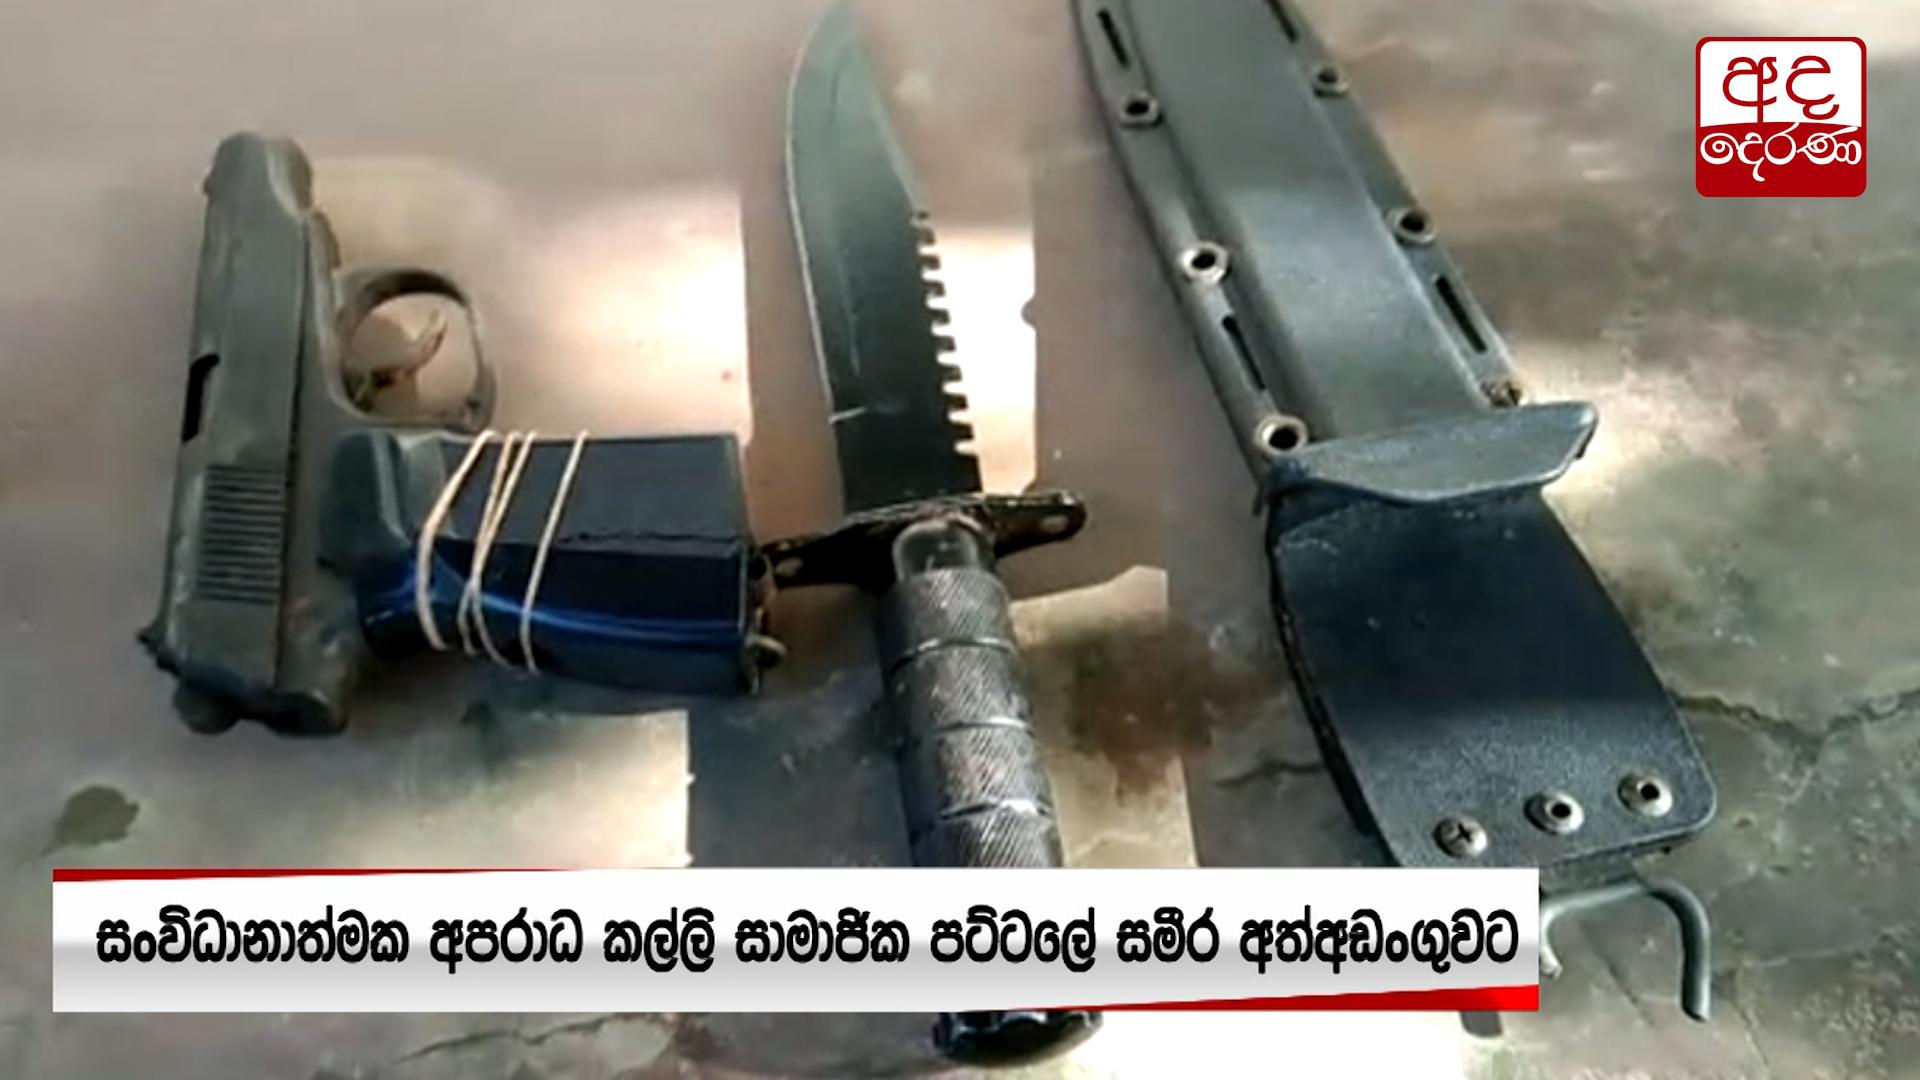 STF arrests underworld figure 'Pattale Sameera'